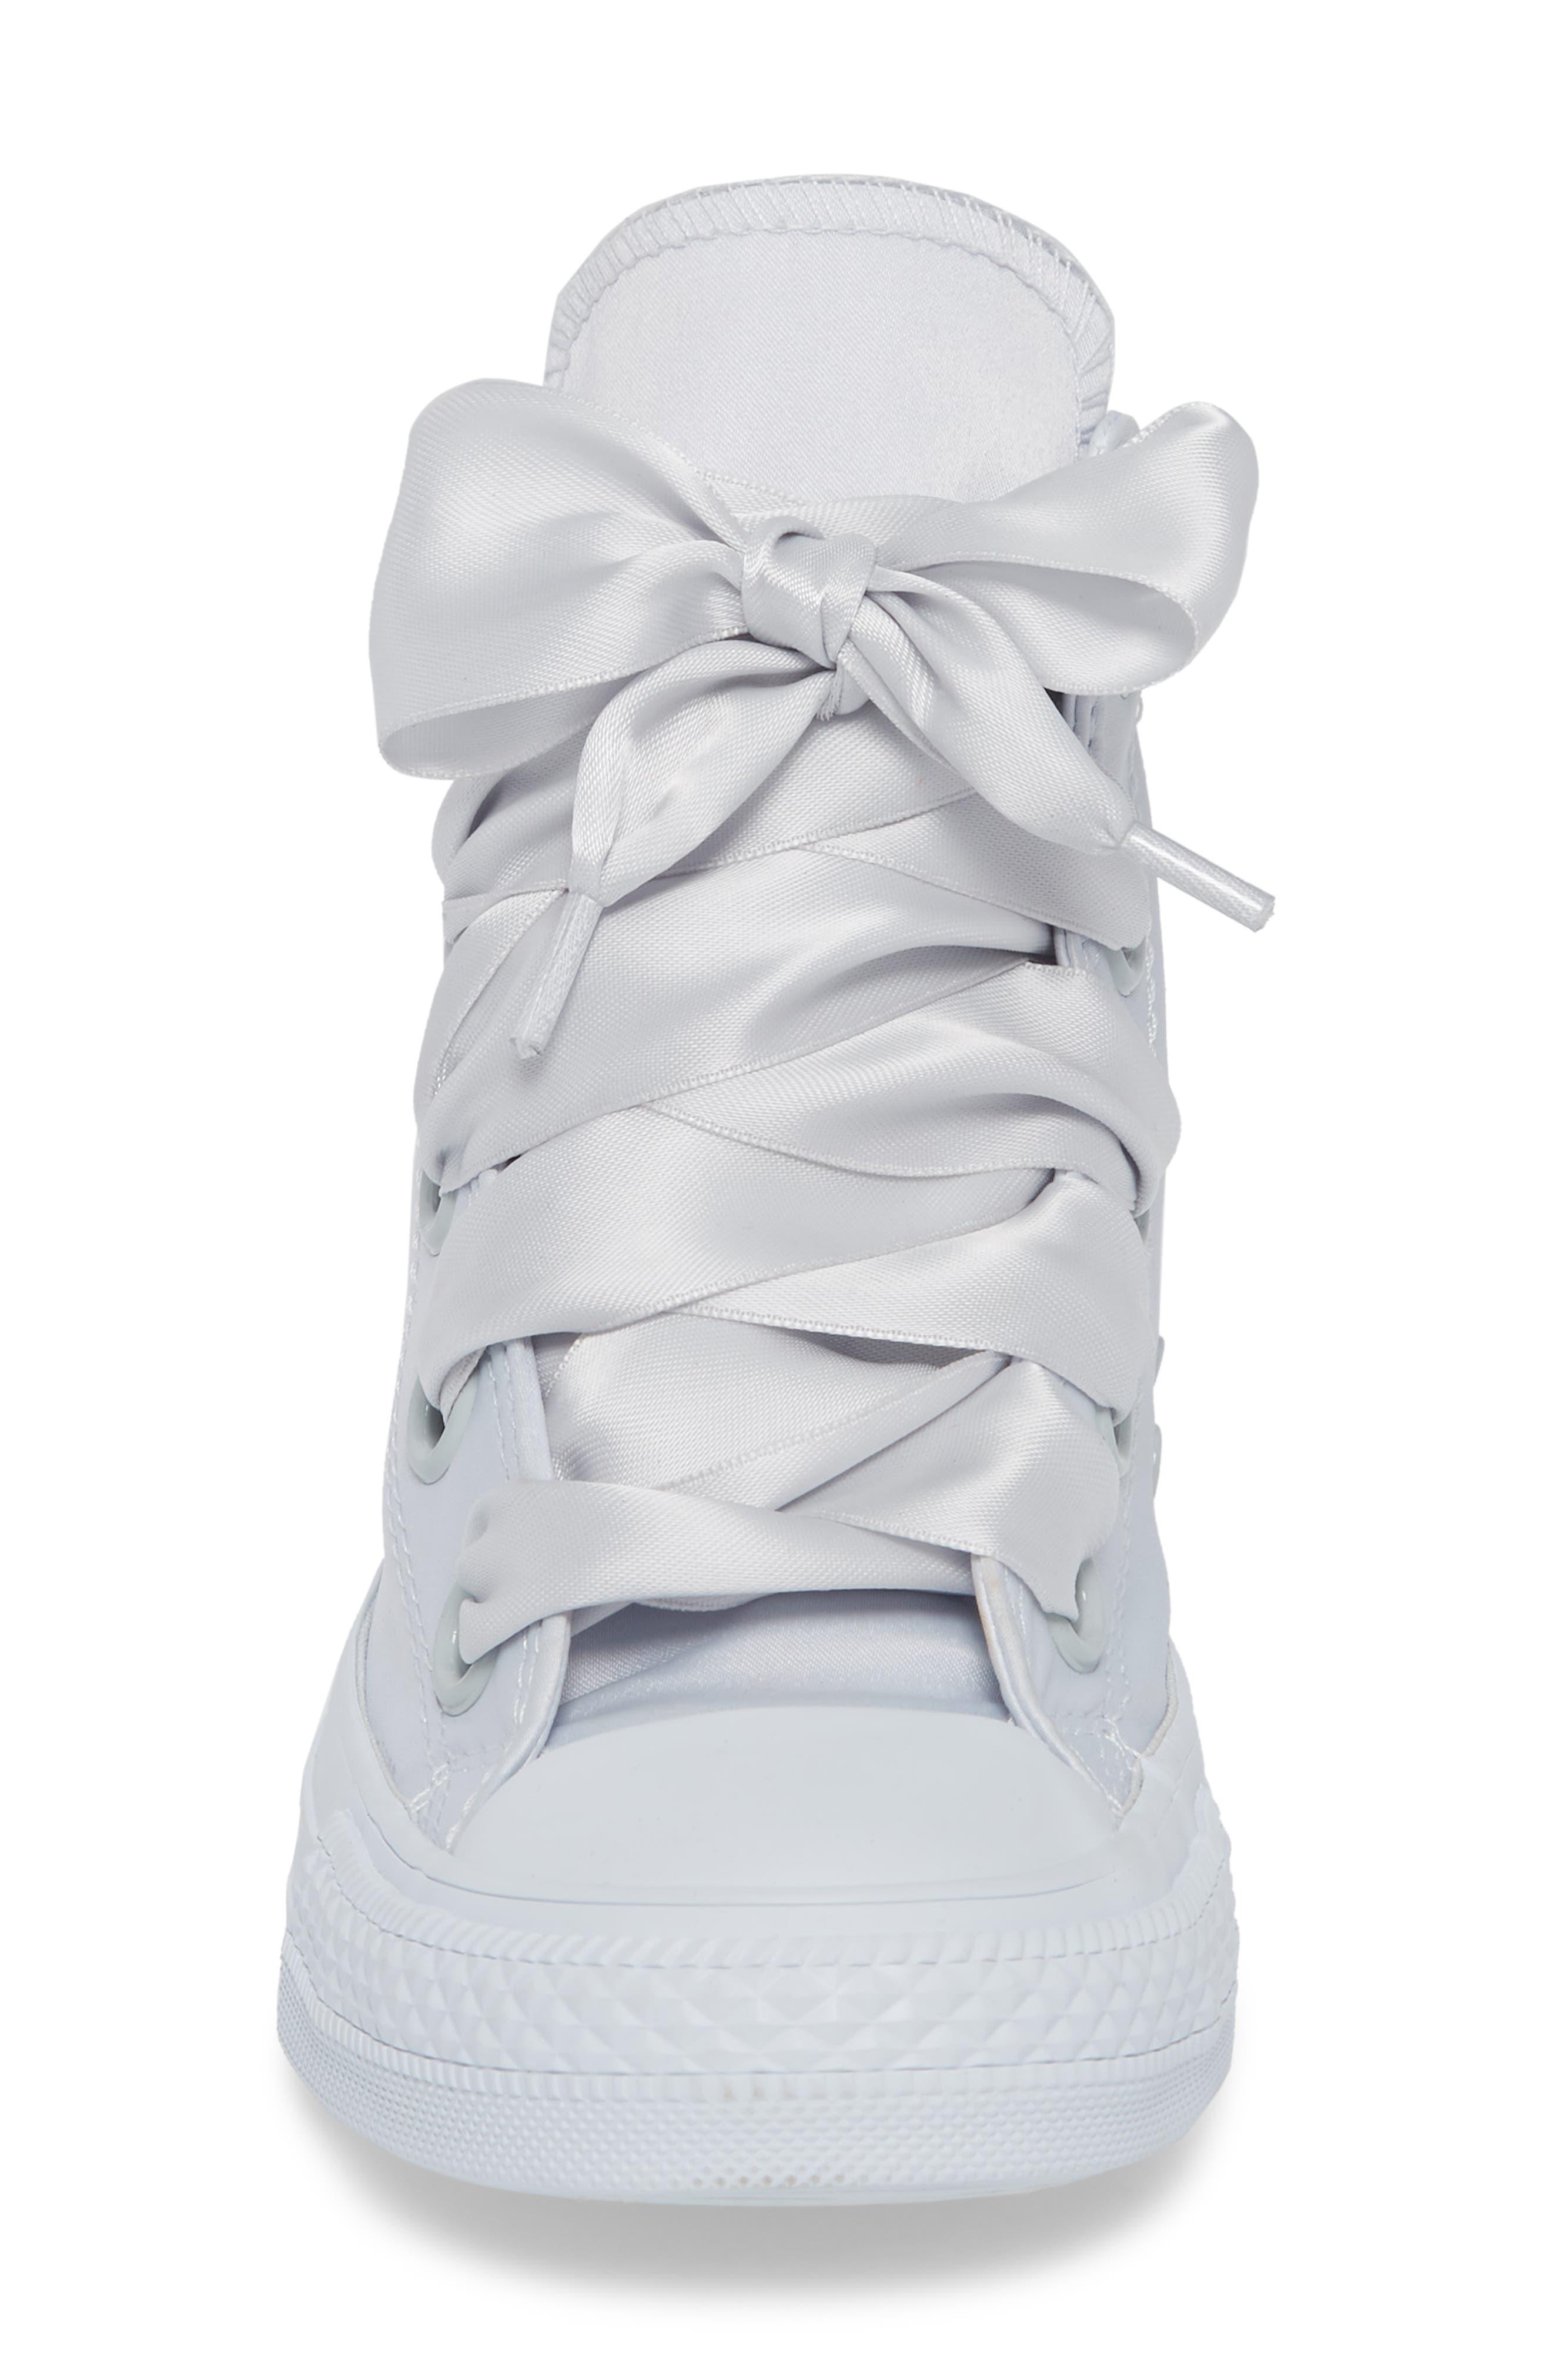 Chuck Taylor<sup>®</sup> All Star<sup>®</sup> Big Eyelet High Top Sneaker,                             Alternate thumbnail 4, color,                             Platinum